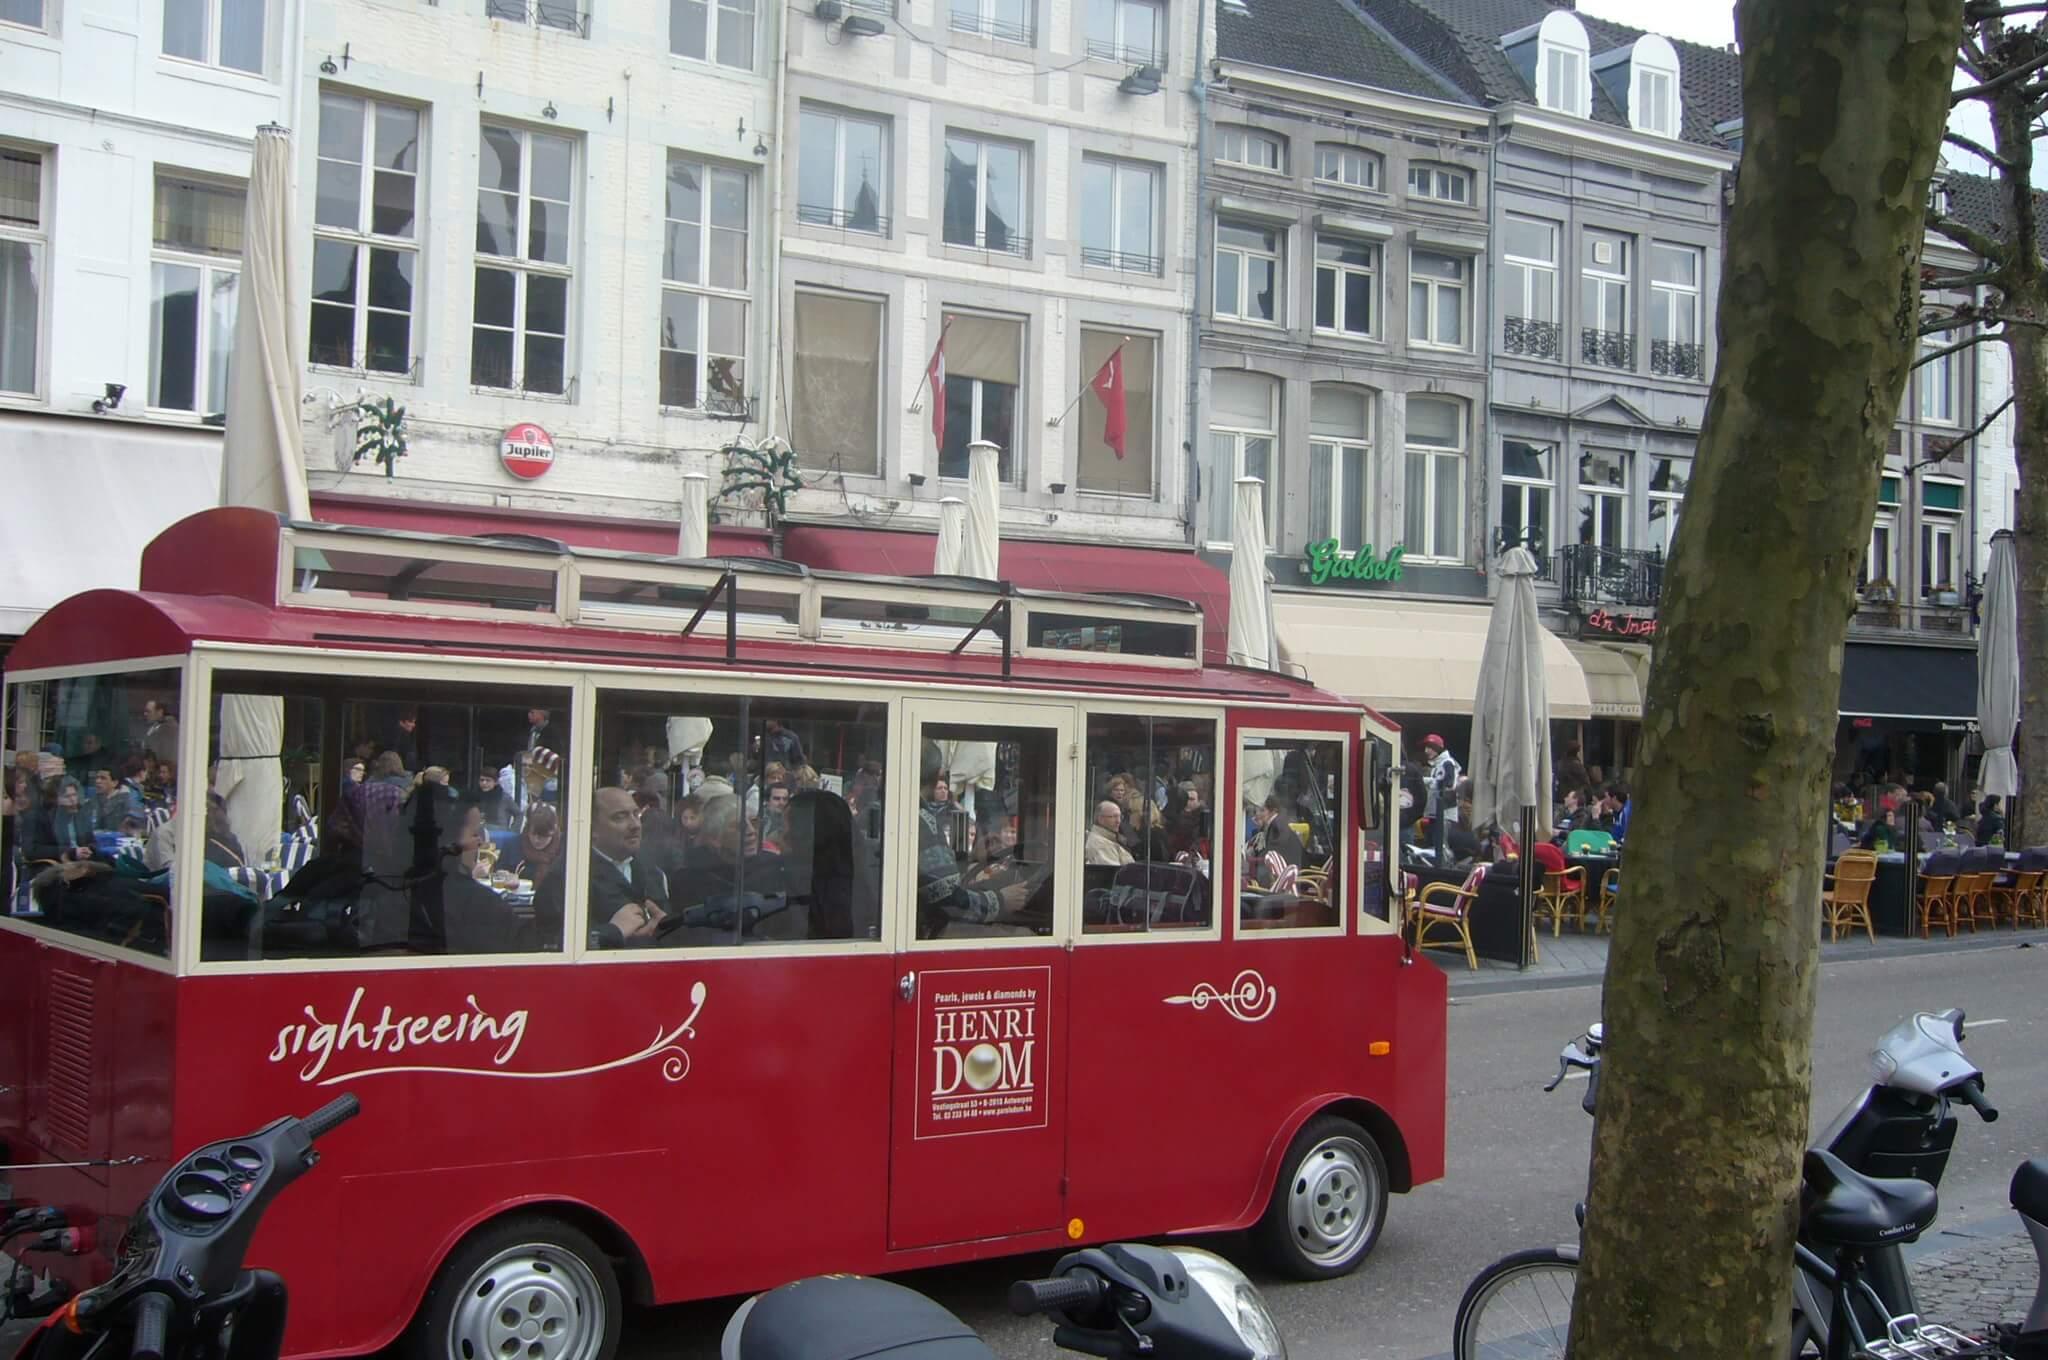 Visiter Maastricht: lieux à visiter, hôtels, restaurants, transports, bons plans